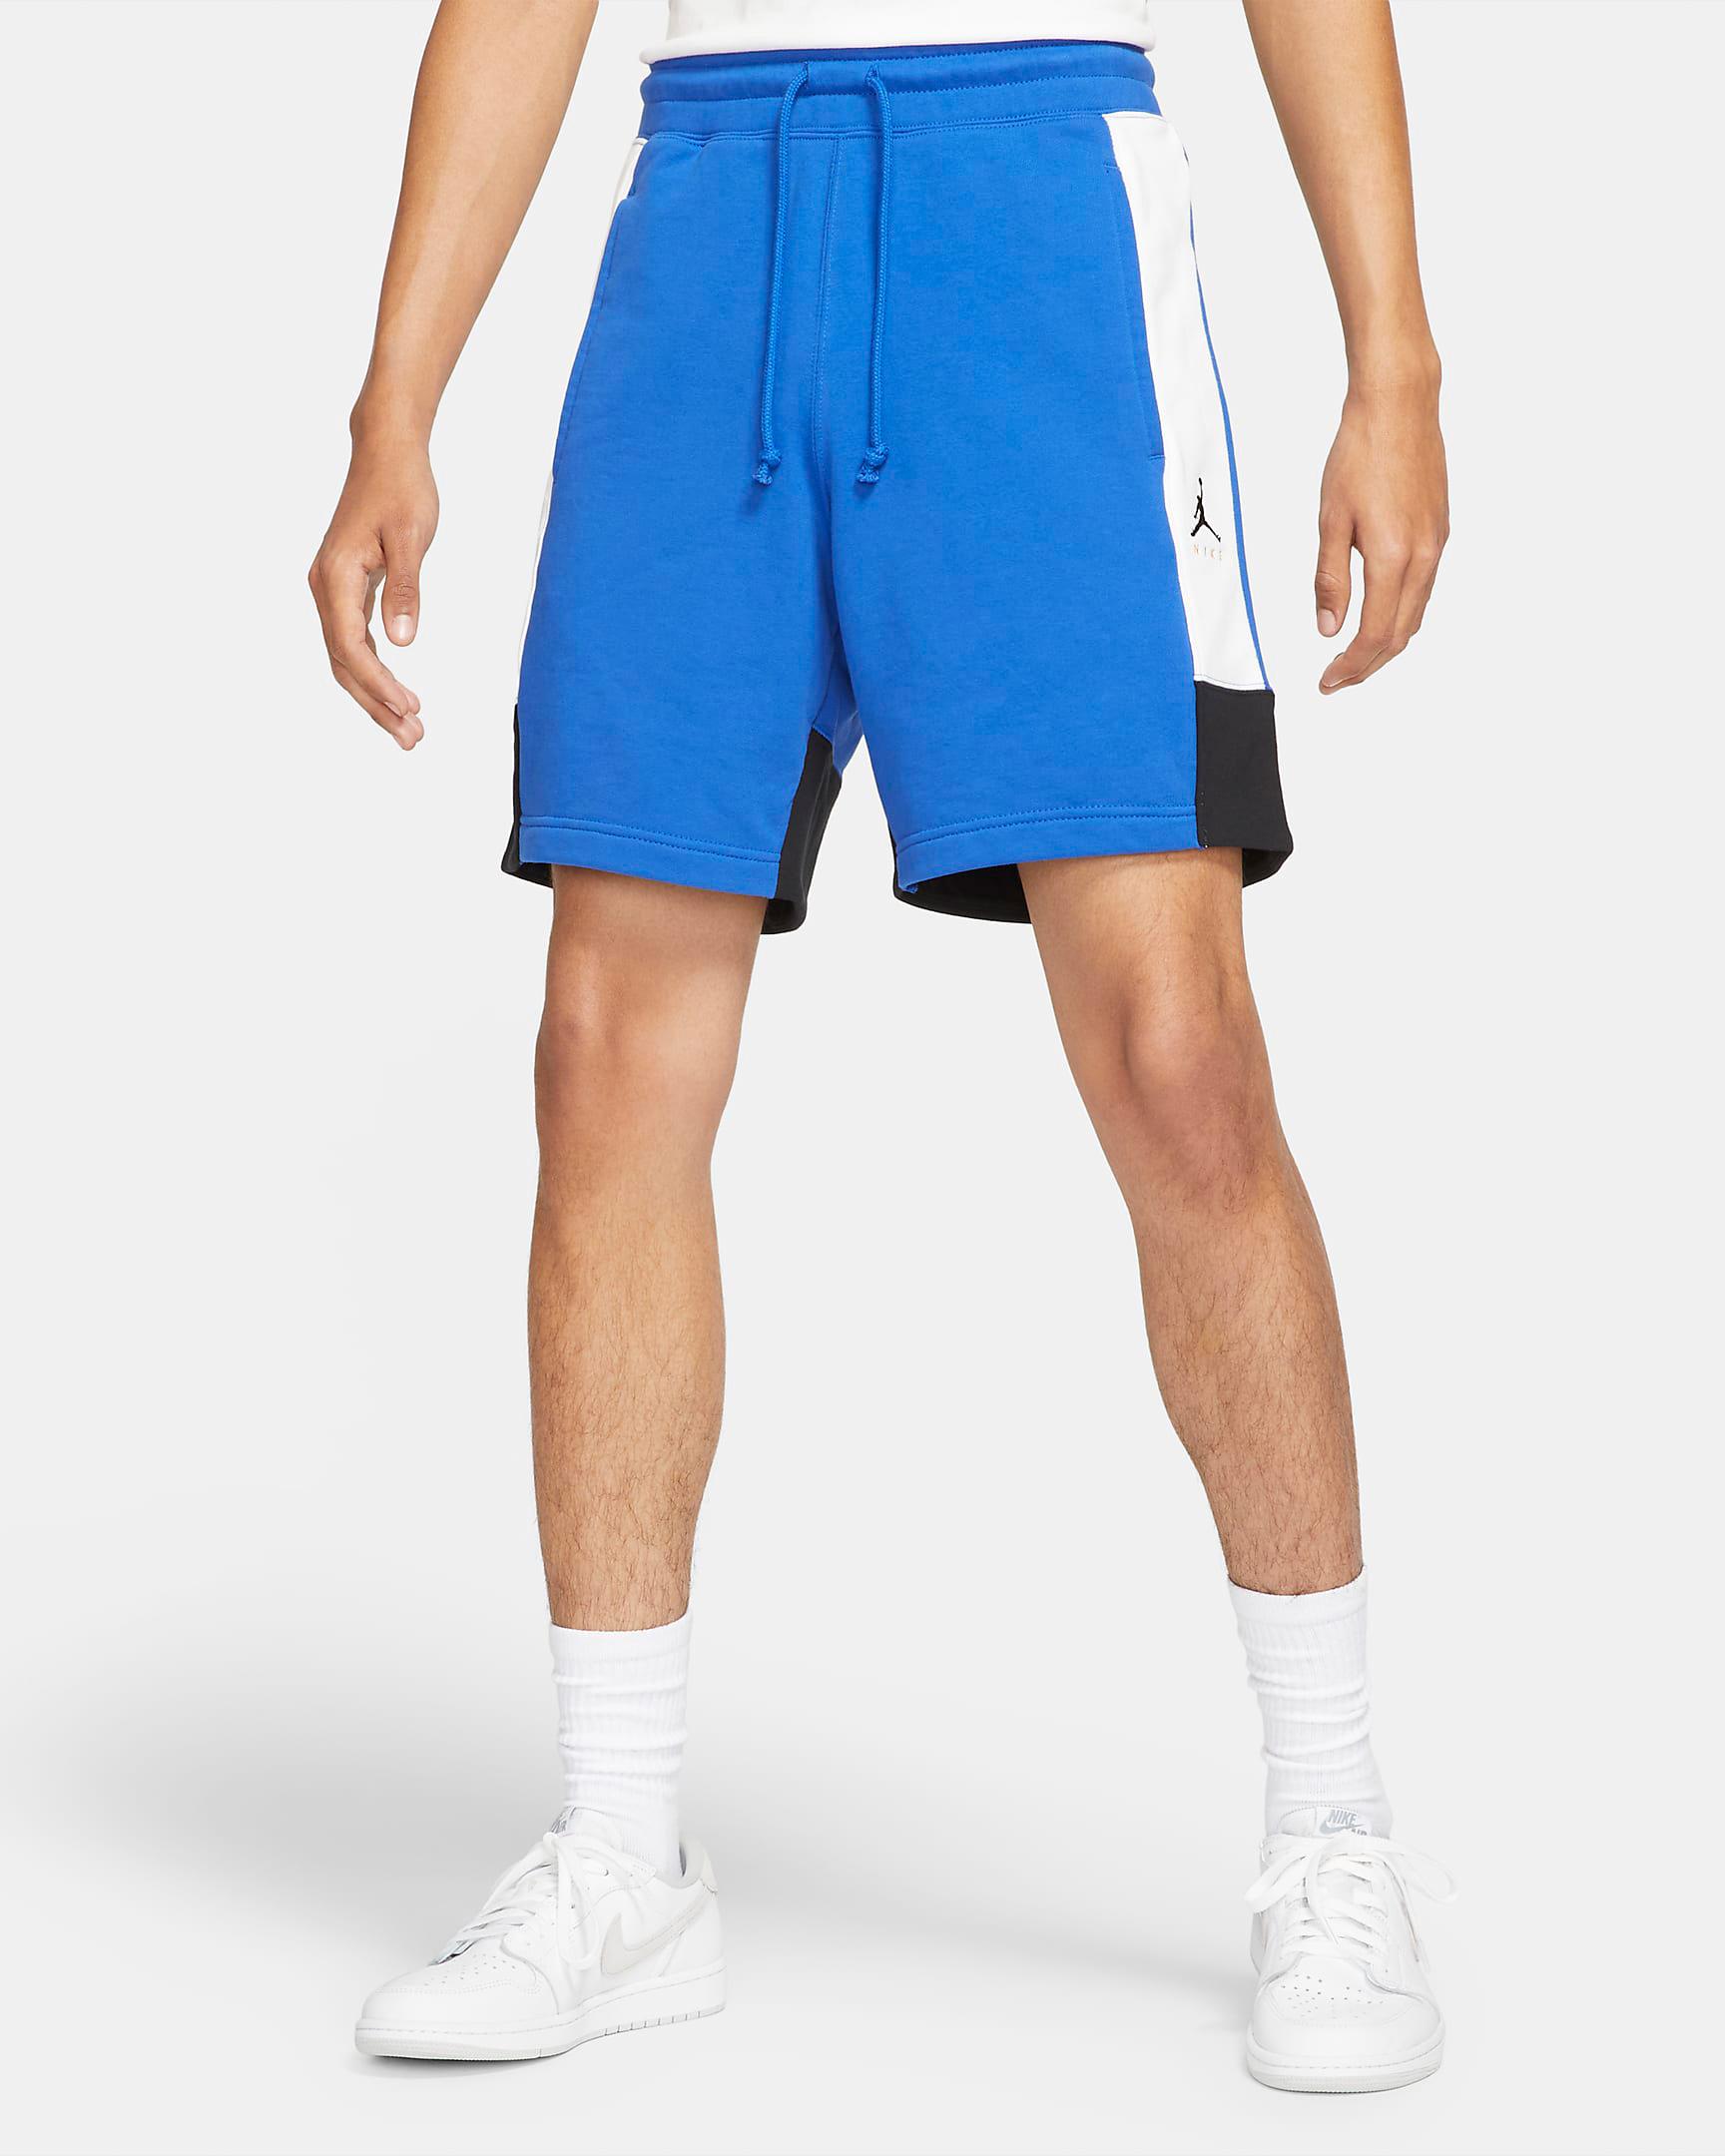 jordan-game-royal-jumpman-fleece-shorts-1